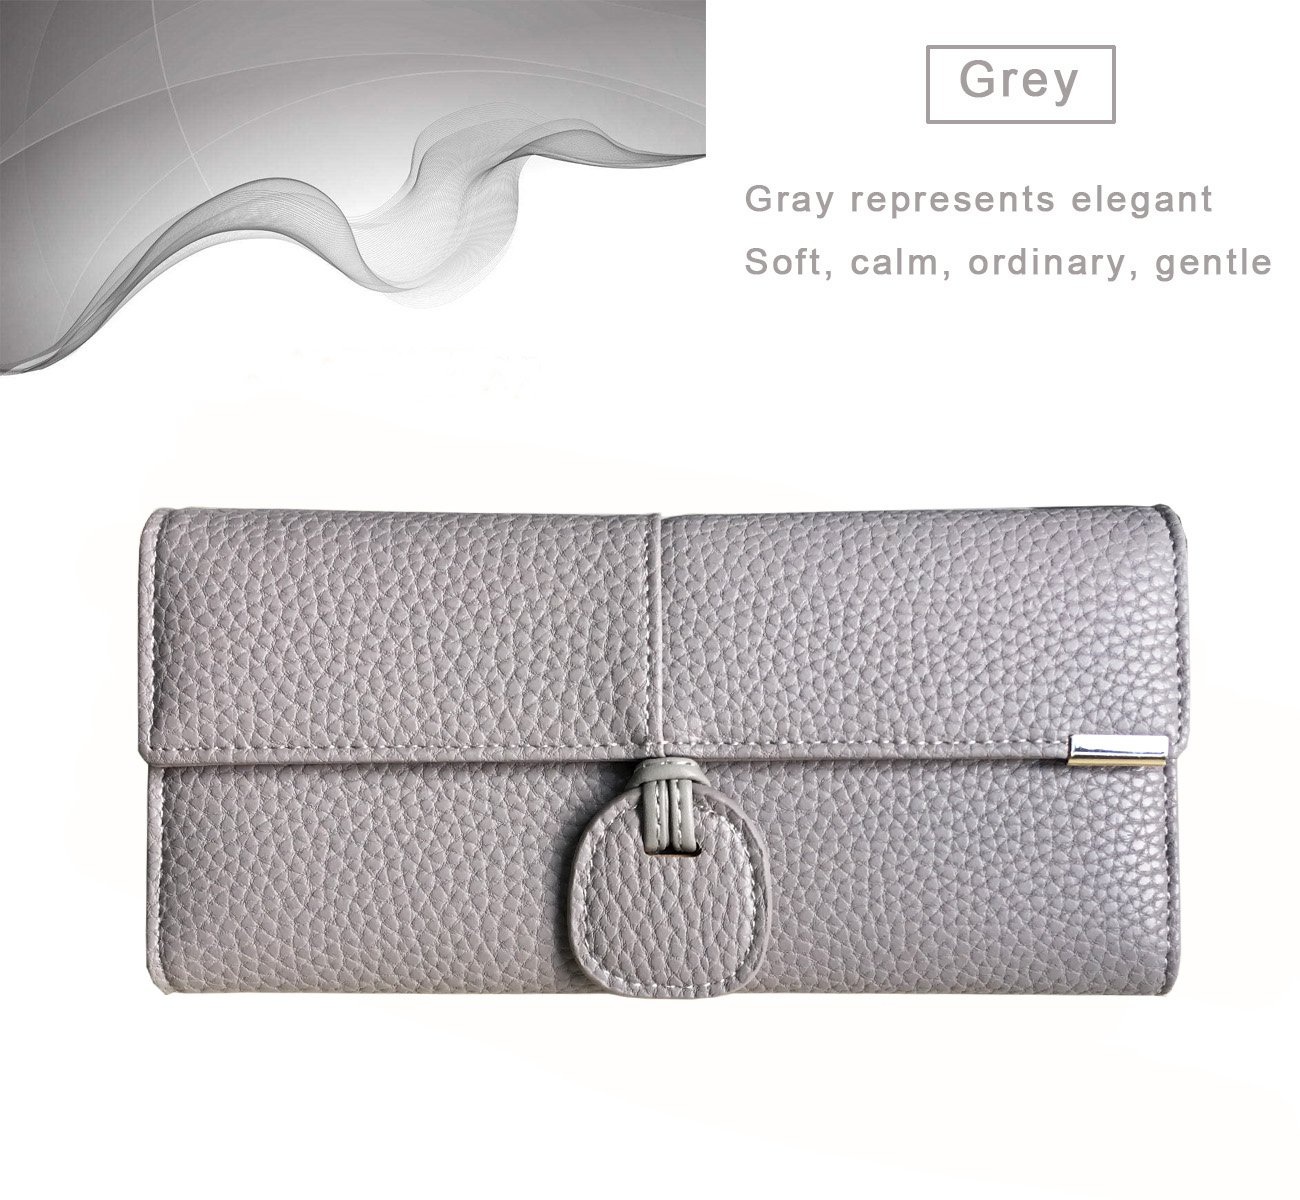 Rfid Blocking Leather wallet for women Girls,ladies long purse Large Capacity(Grey) by YOTOO (Image #6)